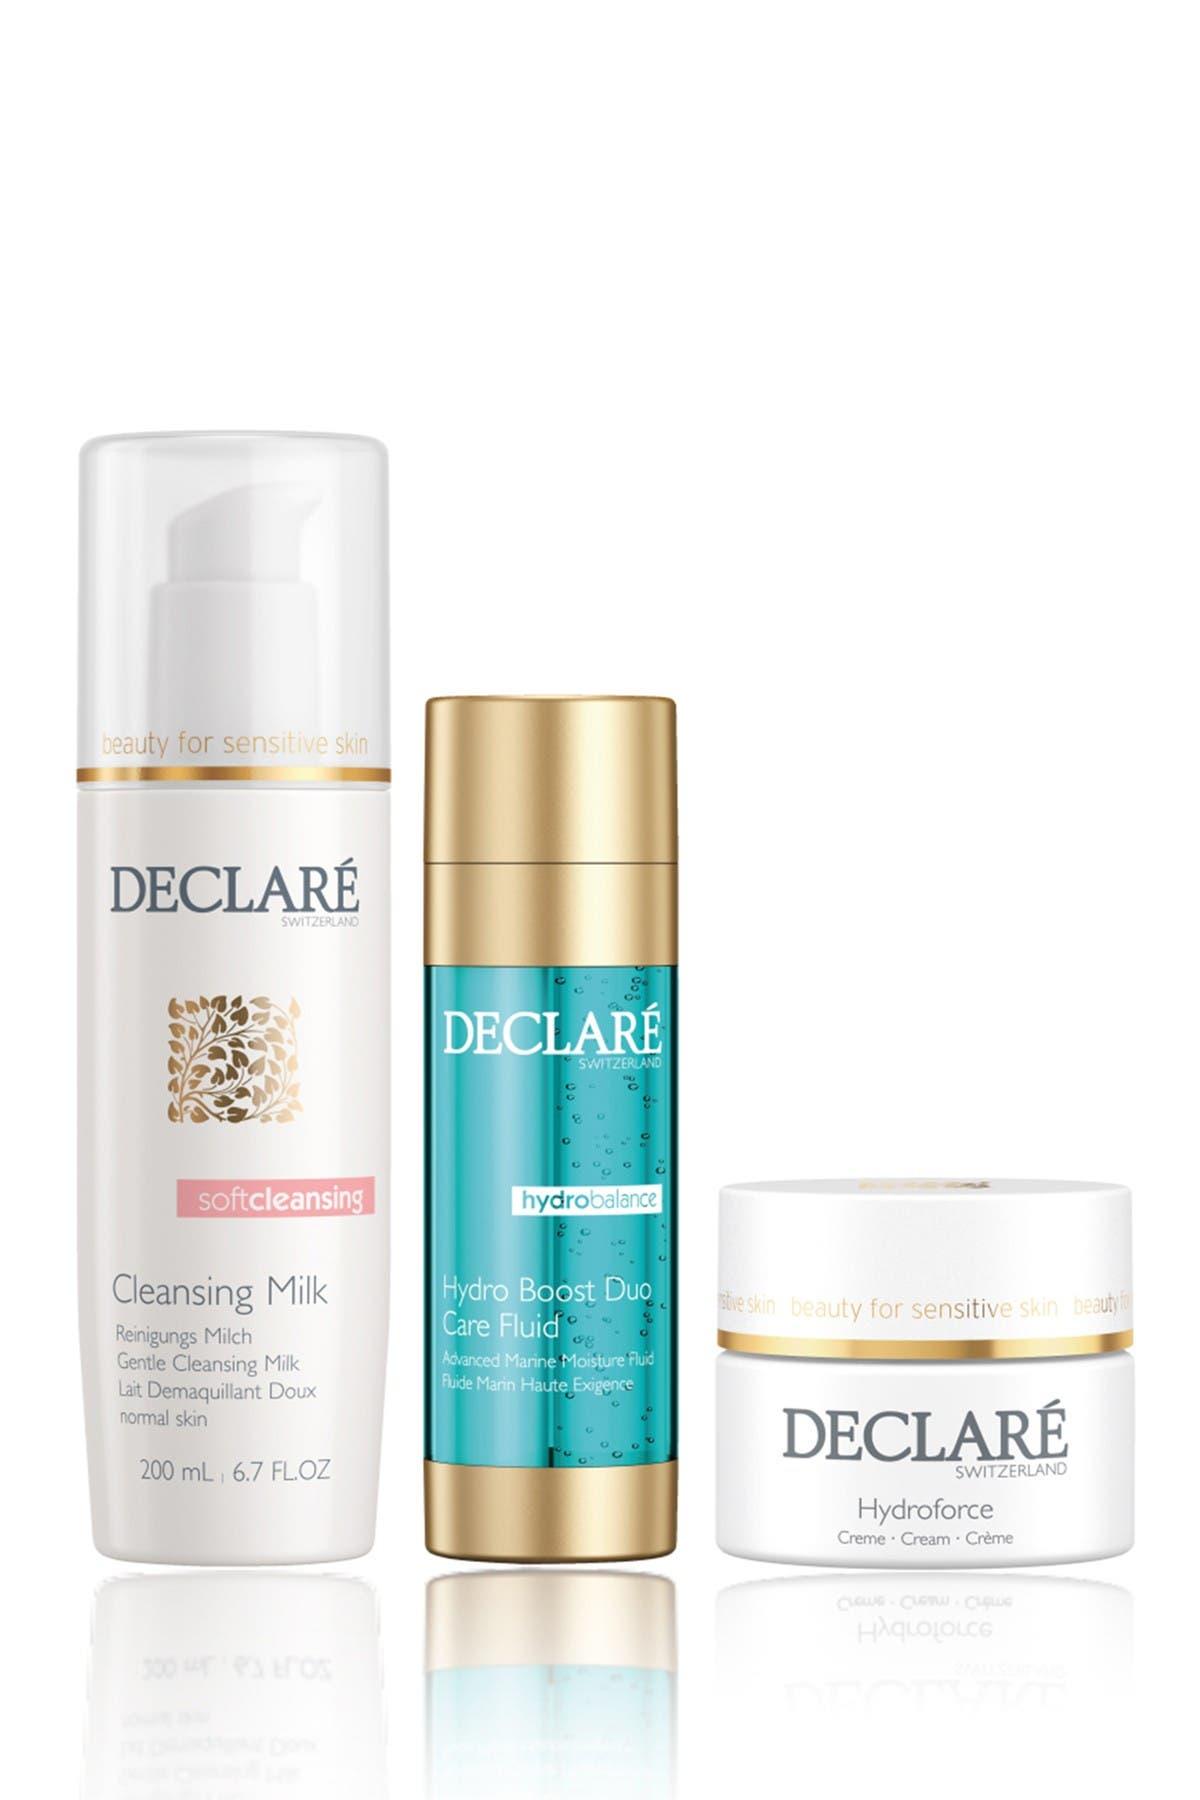 Image of DECLARE Hydro Balance 3-Piece Skincare Set